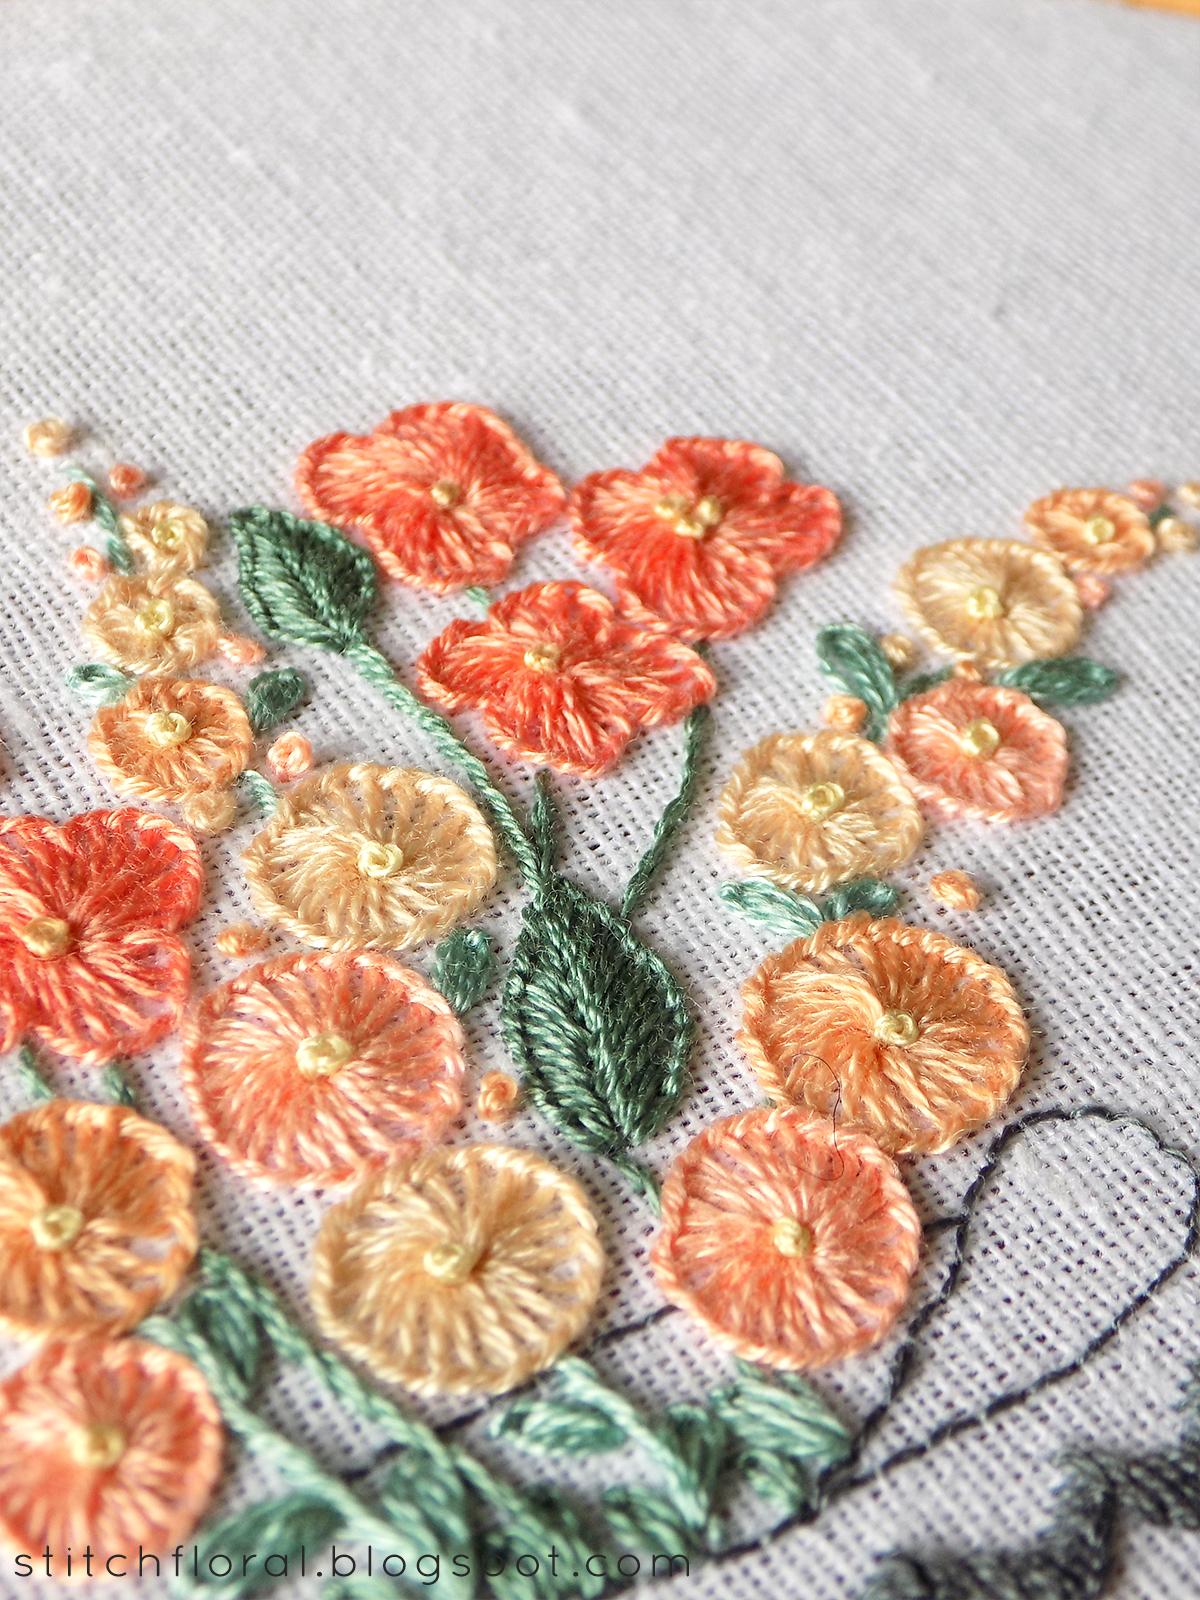 Buttonhole Stitch Practice Free Pdf Pattern Stitch Floral